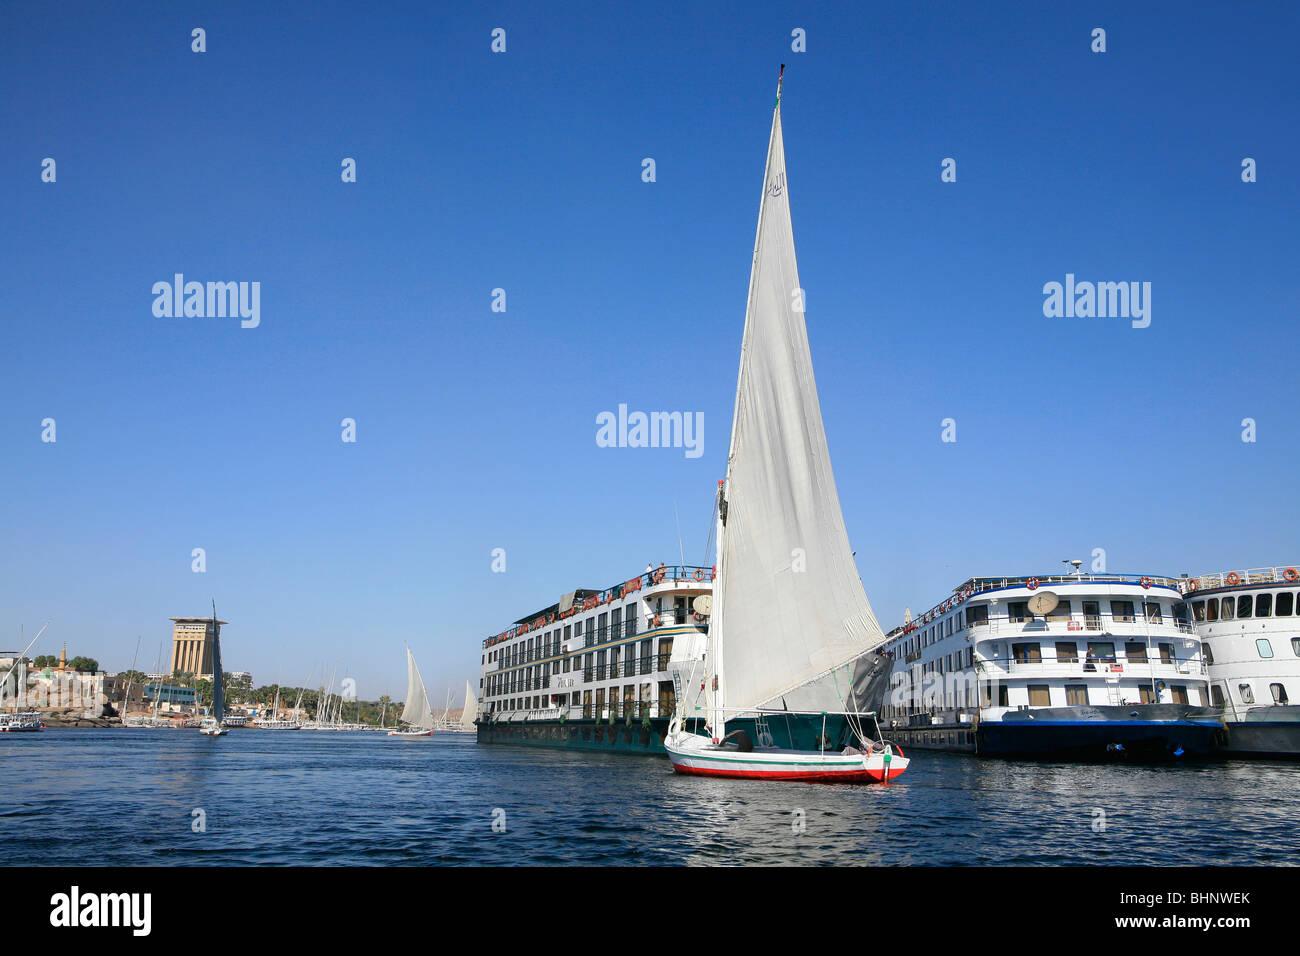 New vs old - Felucca vs cruiseship in Aswan, Egypt - Stock Image